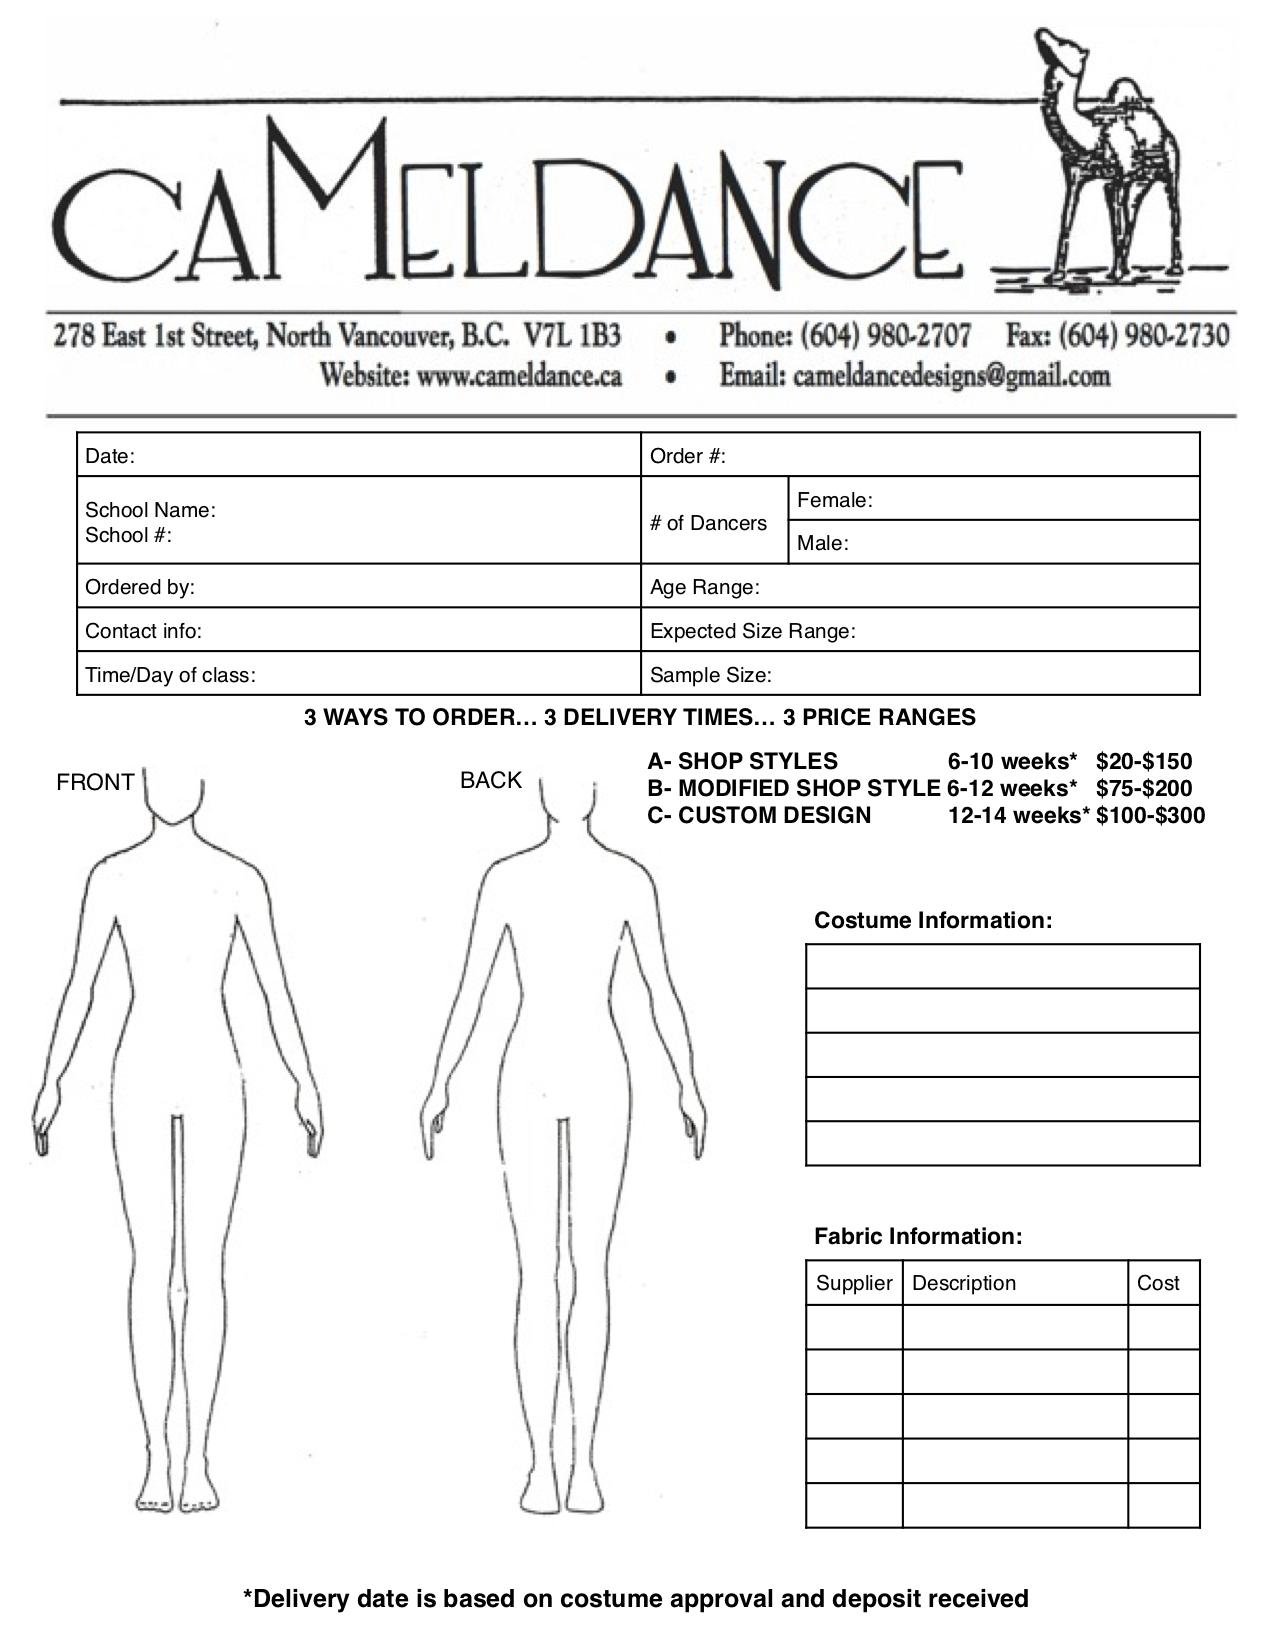 Cameldance Designs.png